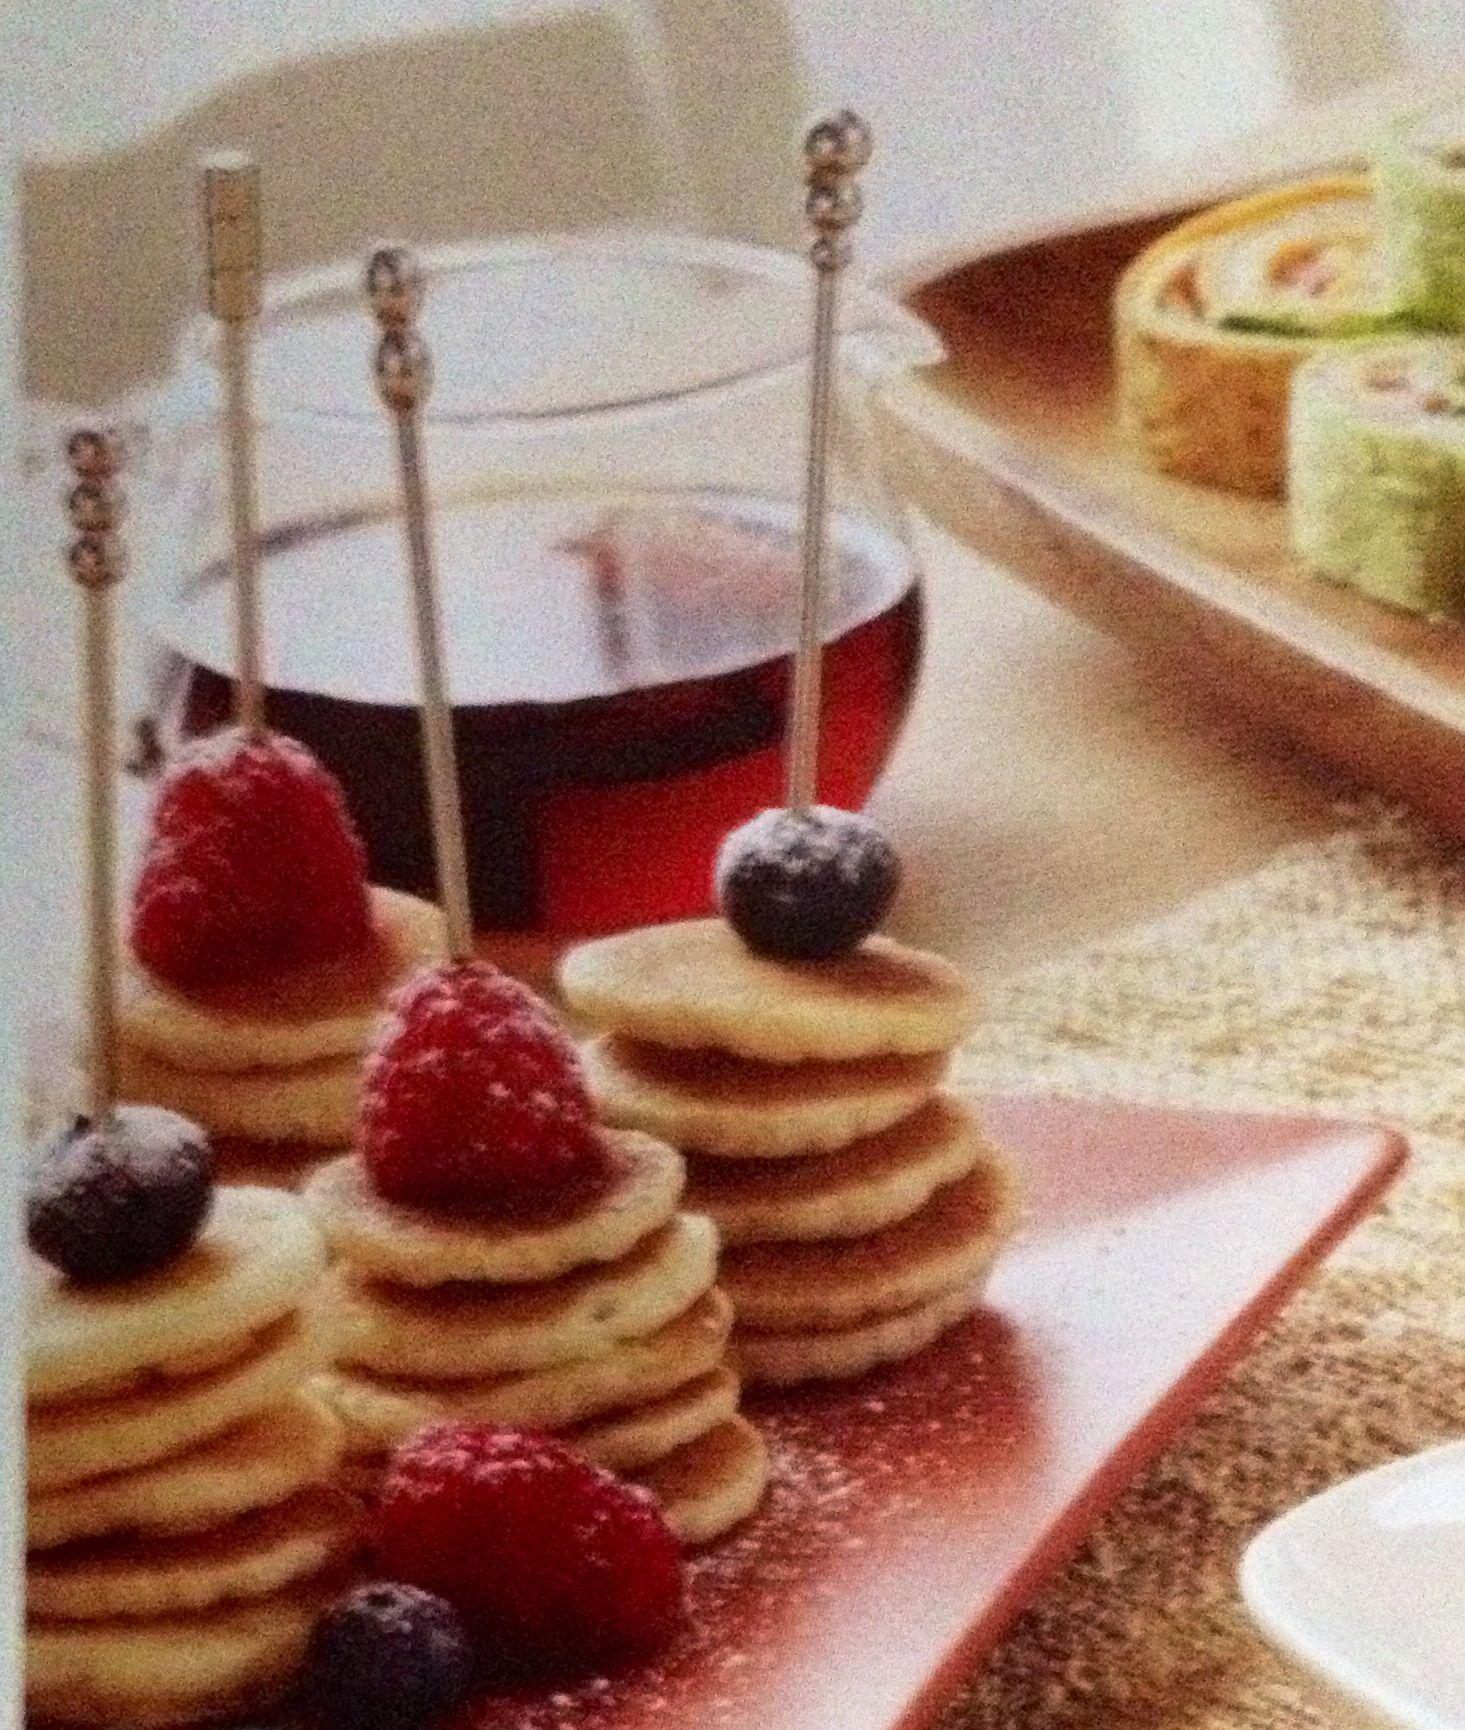 ideas for bridal shower brunch food%0A Brunch ideas